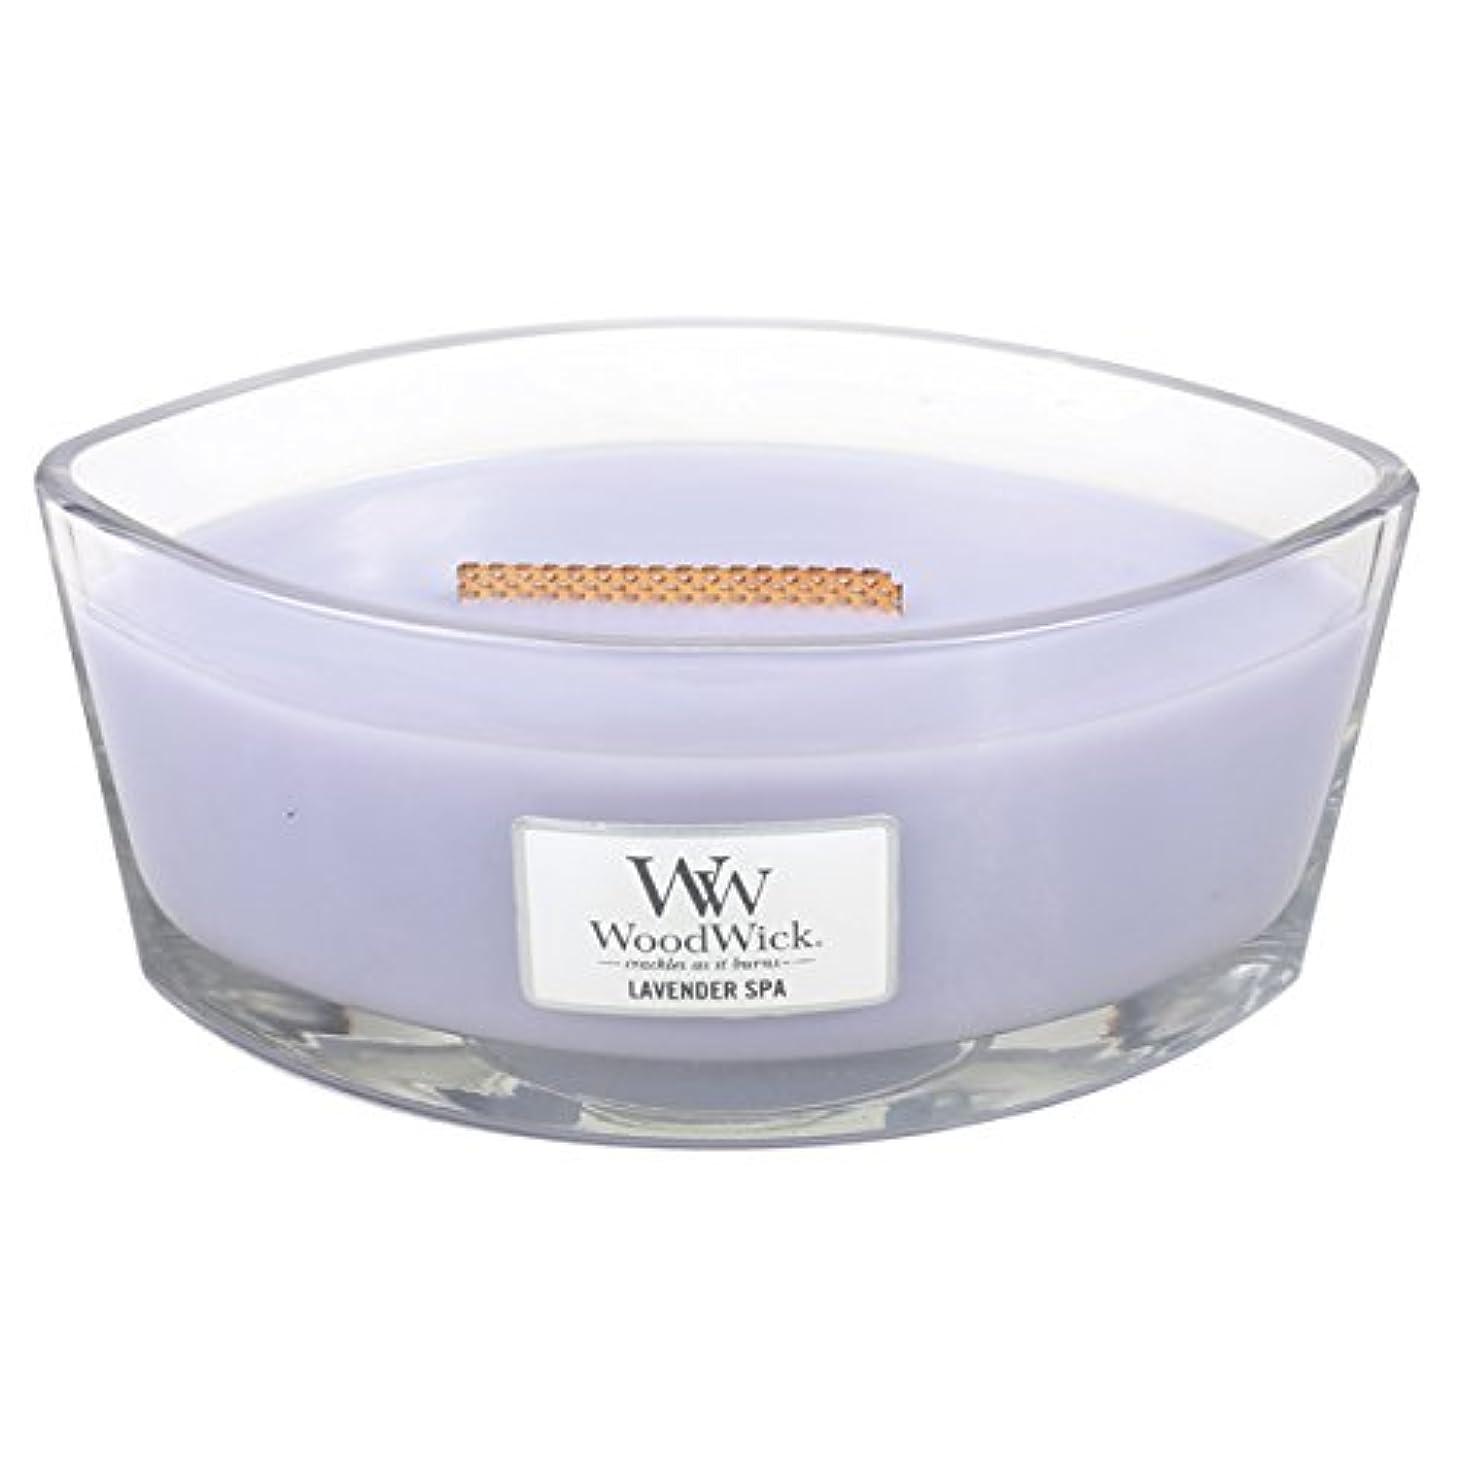 Wood Wick ハースウィックL 「 ラベンダースパ 」 キャンドル W940053028